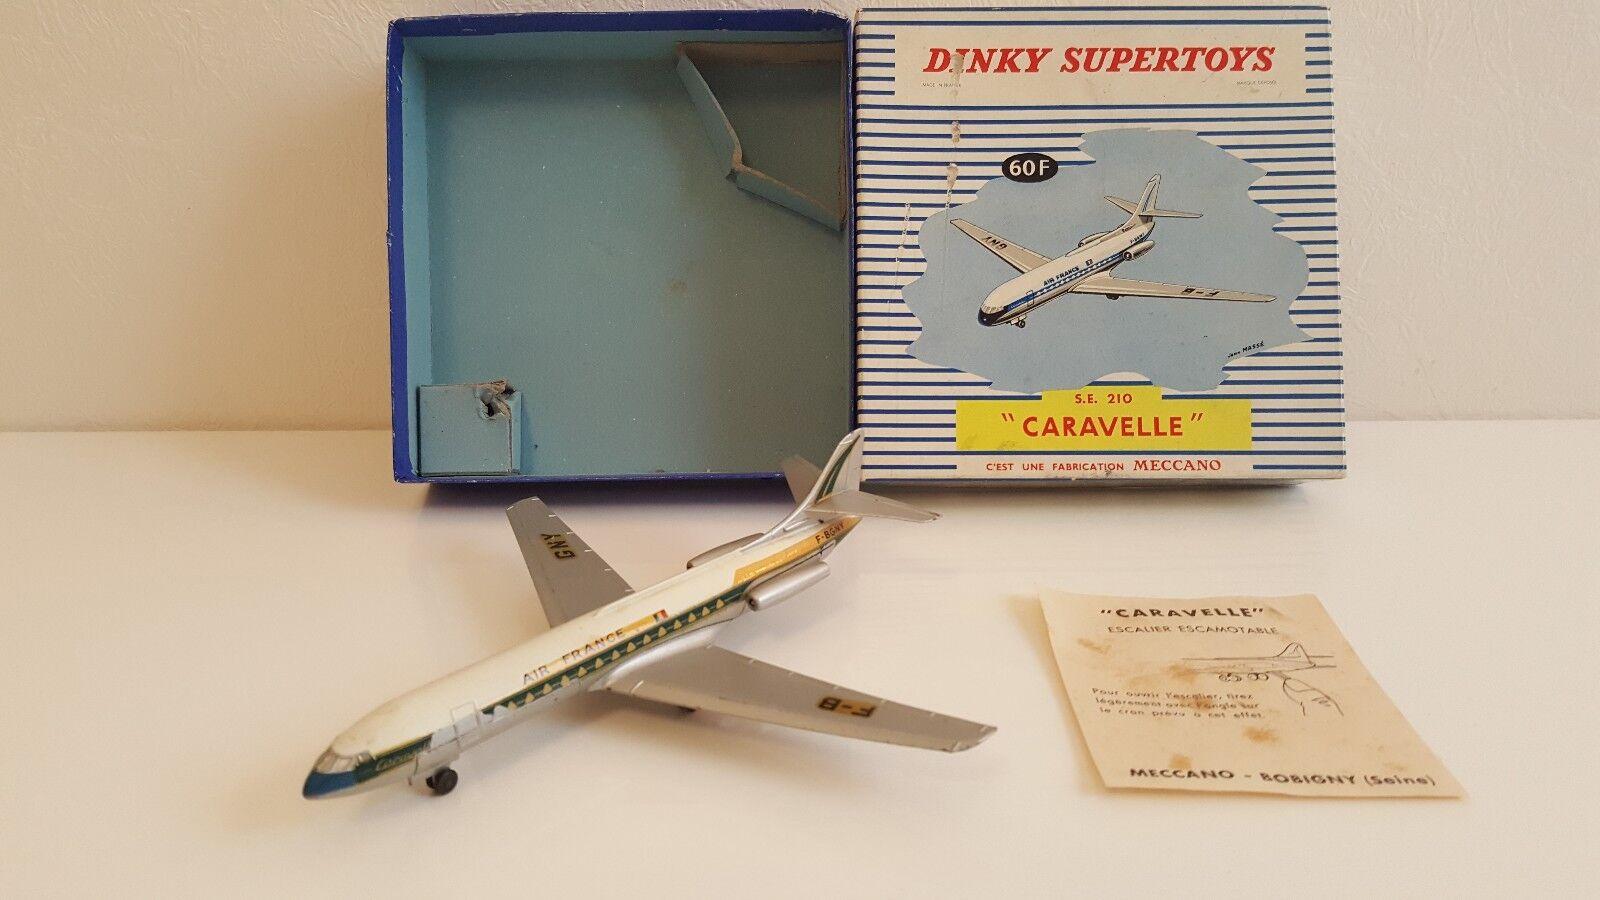 Dinky Spielzeugs - 60 F - Avion voitureavelle SE 210 en boîte d'origine